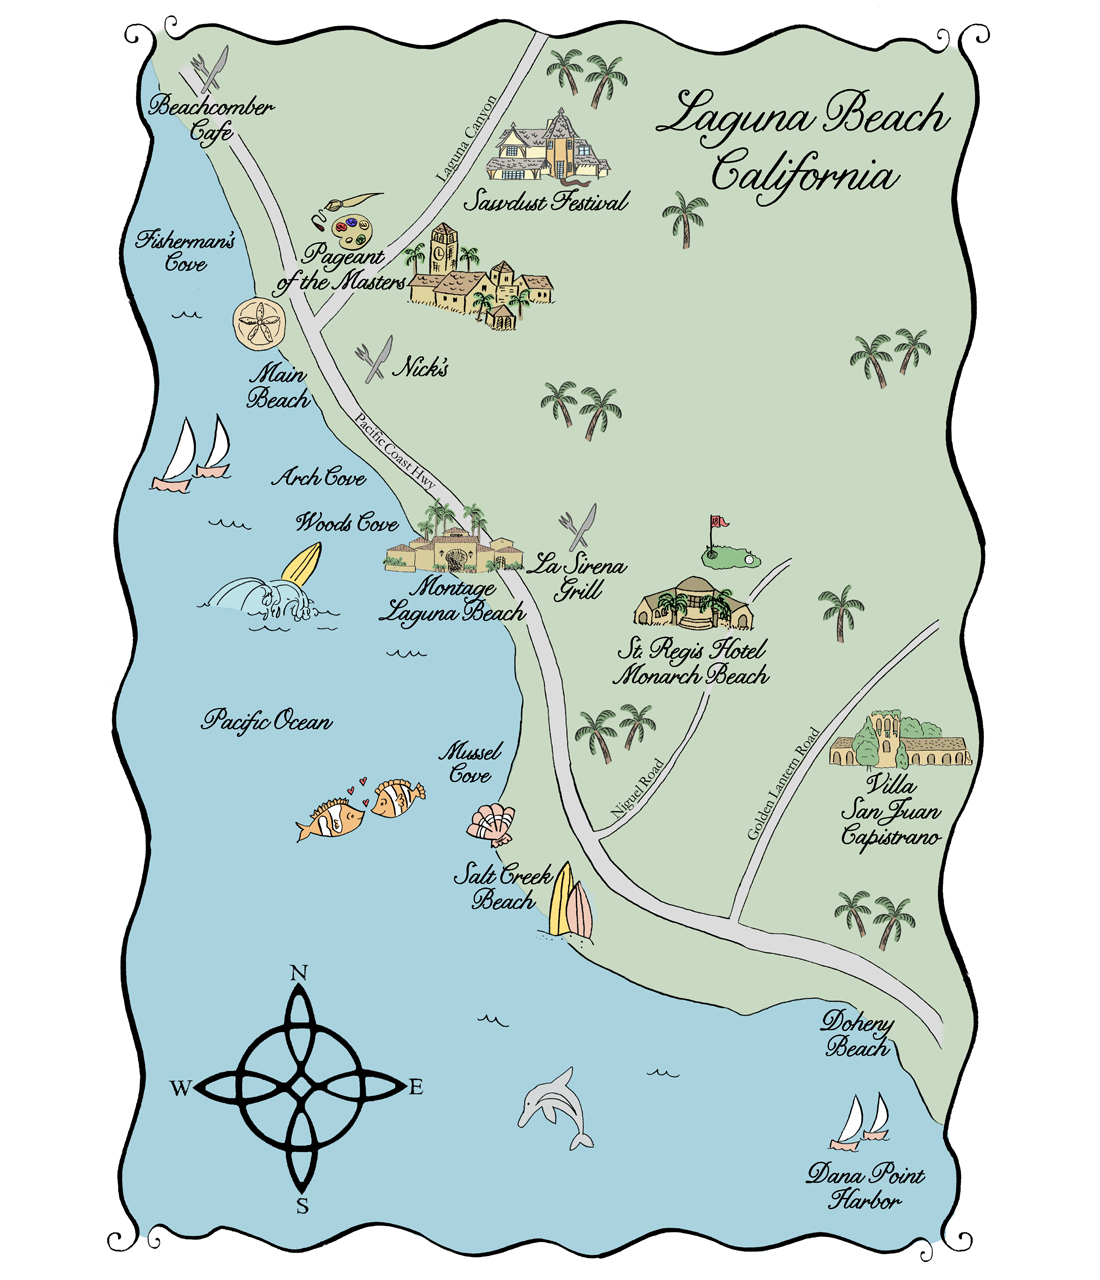 Laguna Beach California Map - Klipy - West Palm Beach California Map